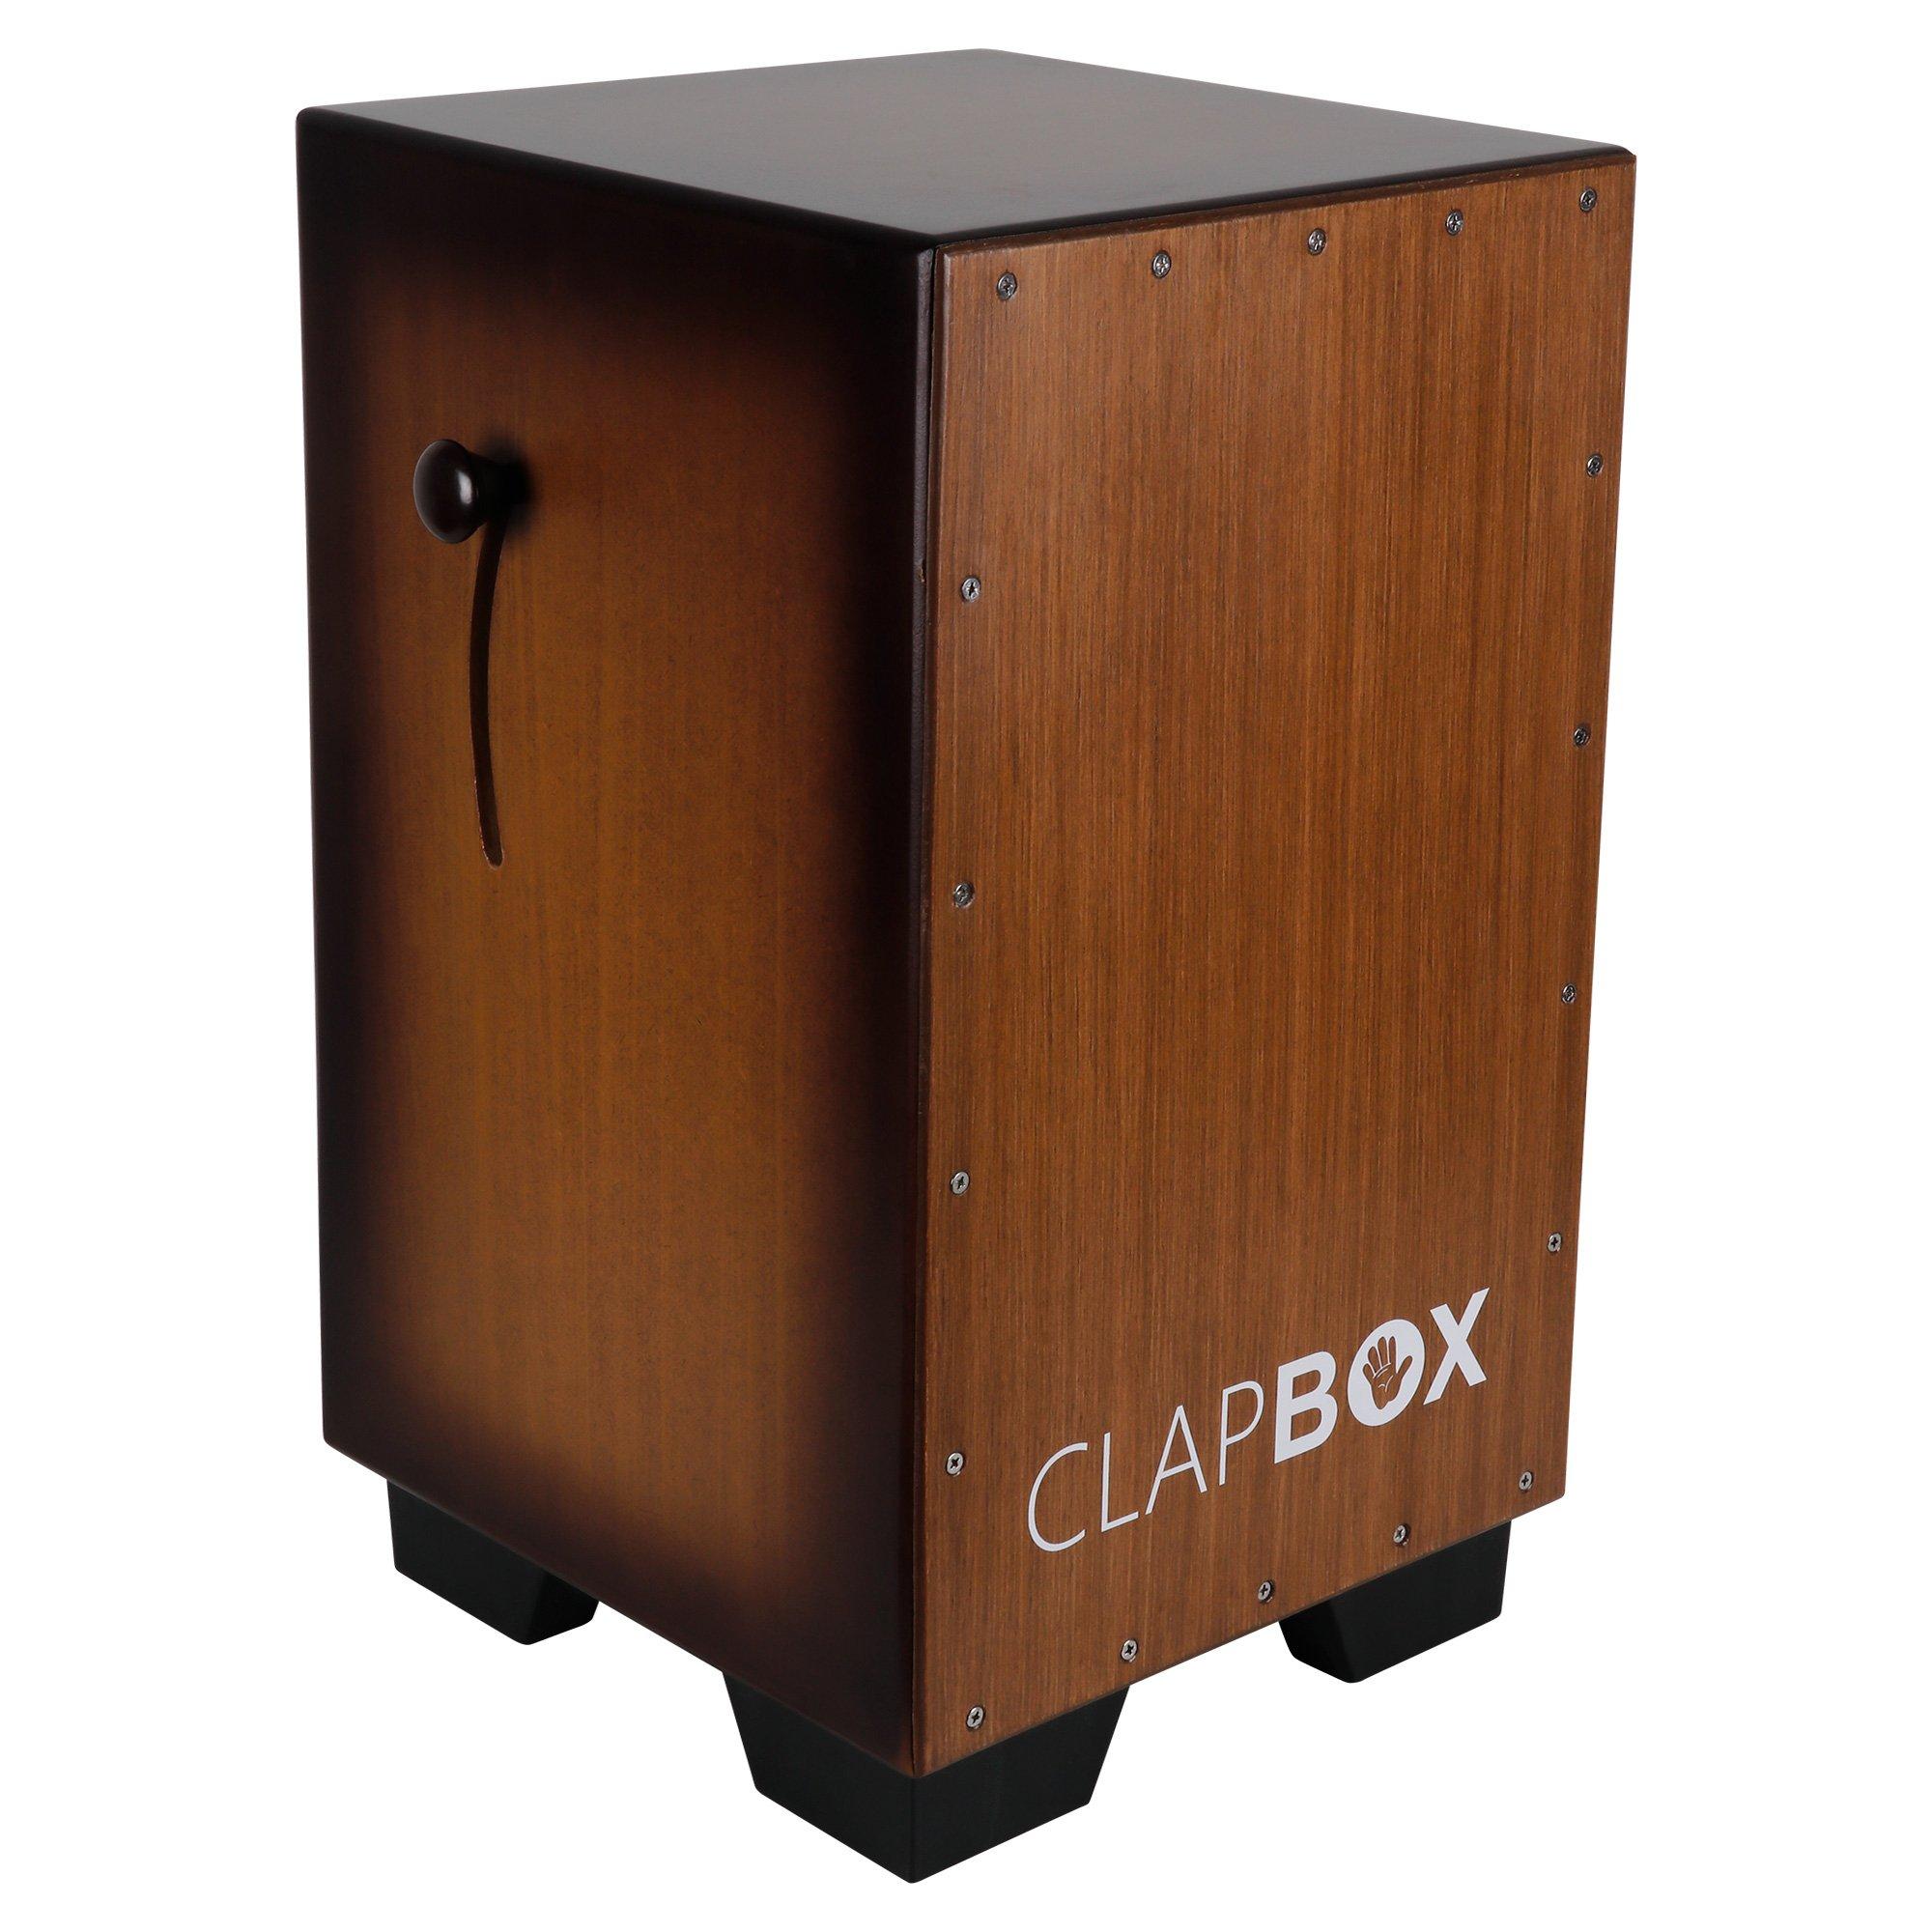 Clapbox Adjustable Snare Cajon CB65- Birch Wood, (H:50 W:30 L:30) - 3 Internal Snares product image